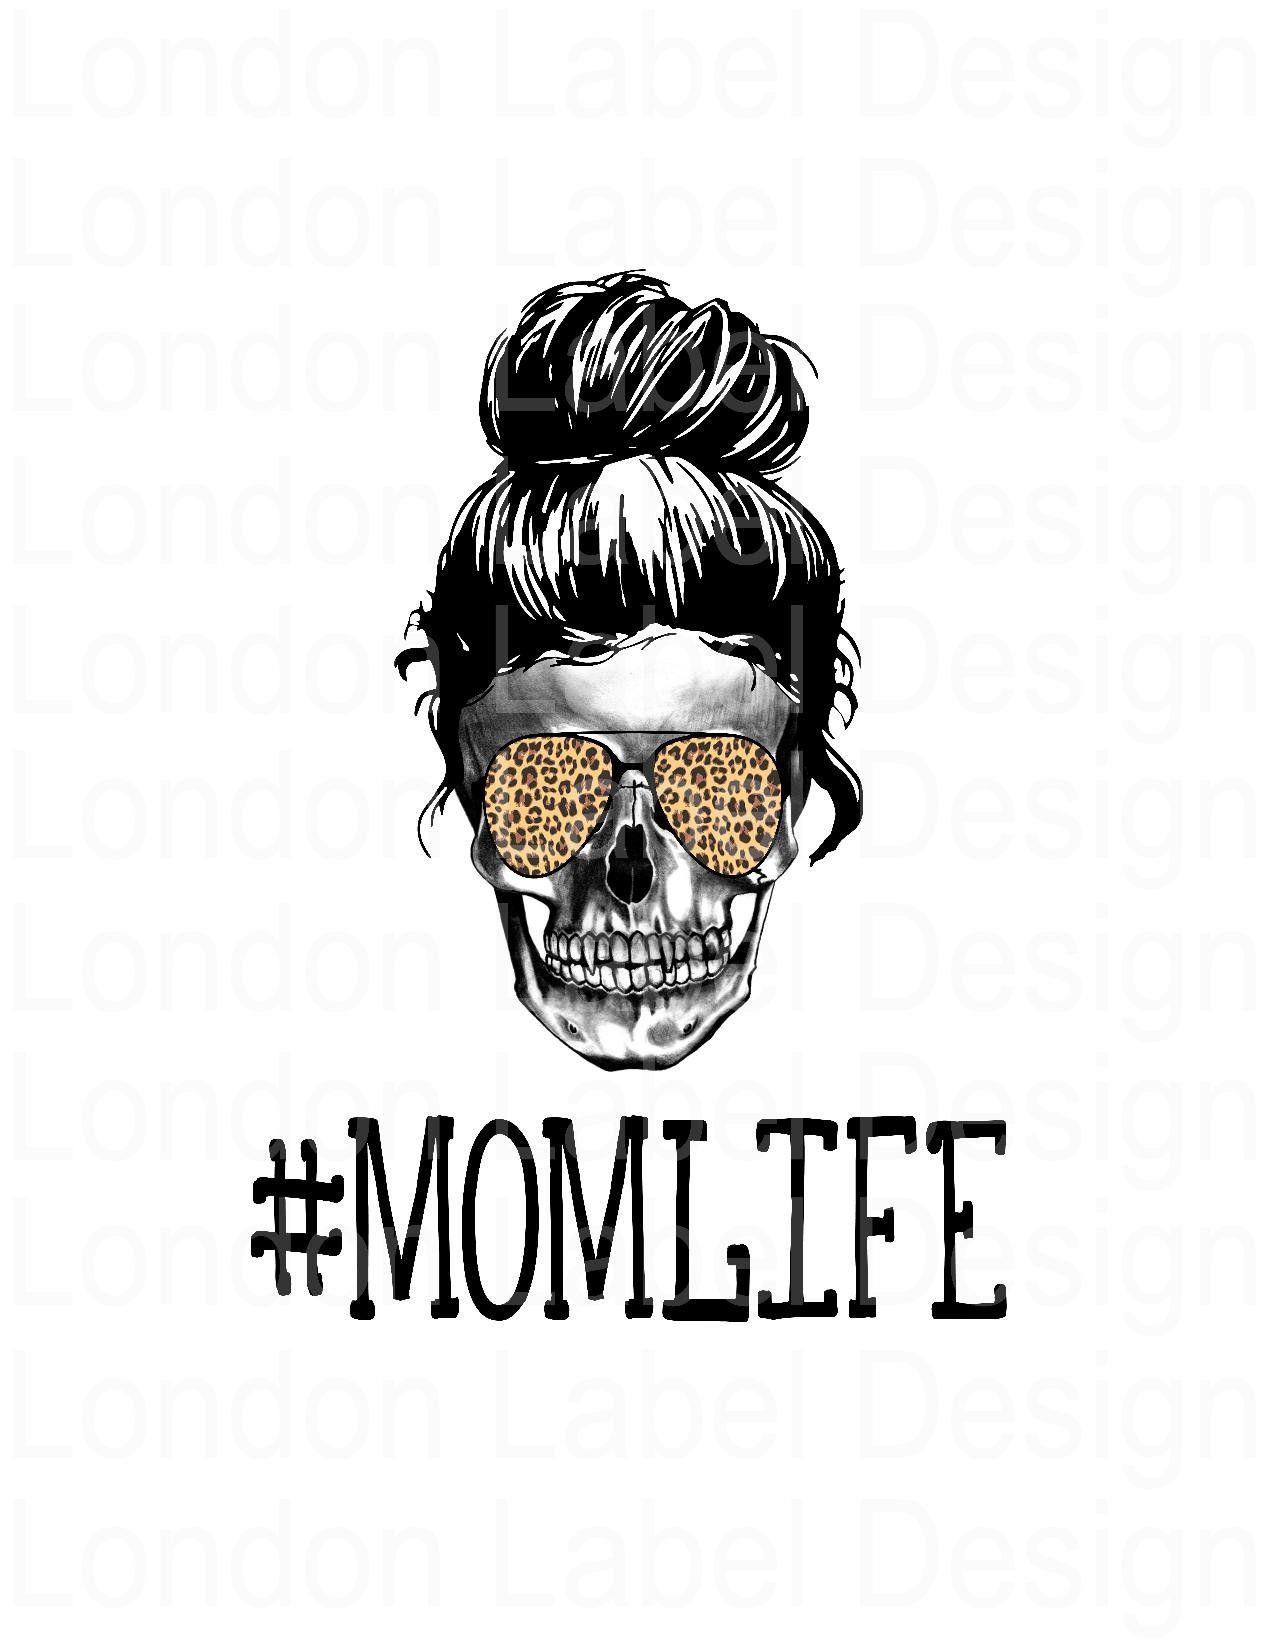 Svg File Messy Bun Mom Life Svg Free – 310+ SVG PNG EPS DXF in Zip File